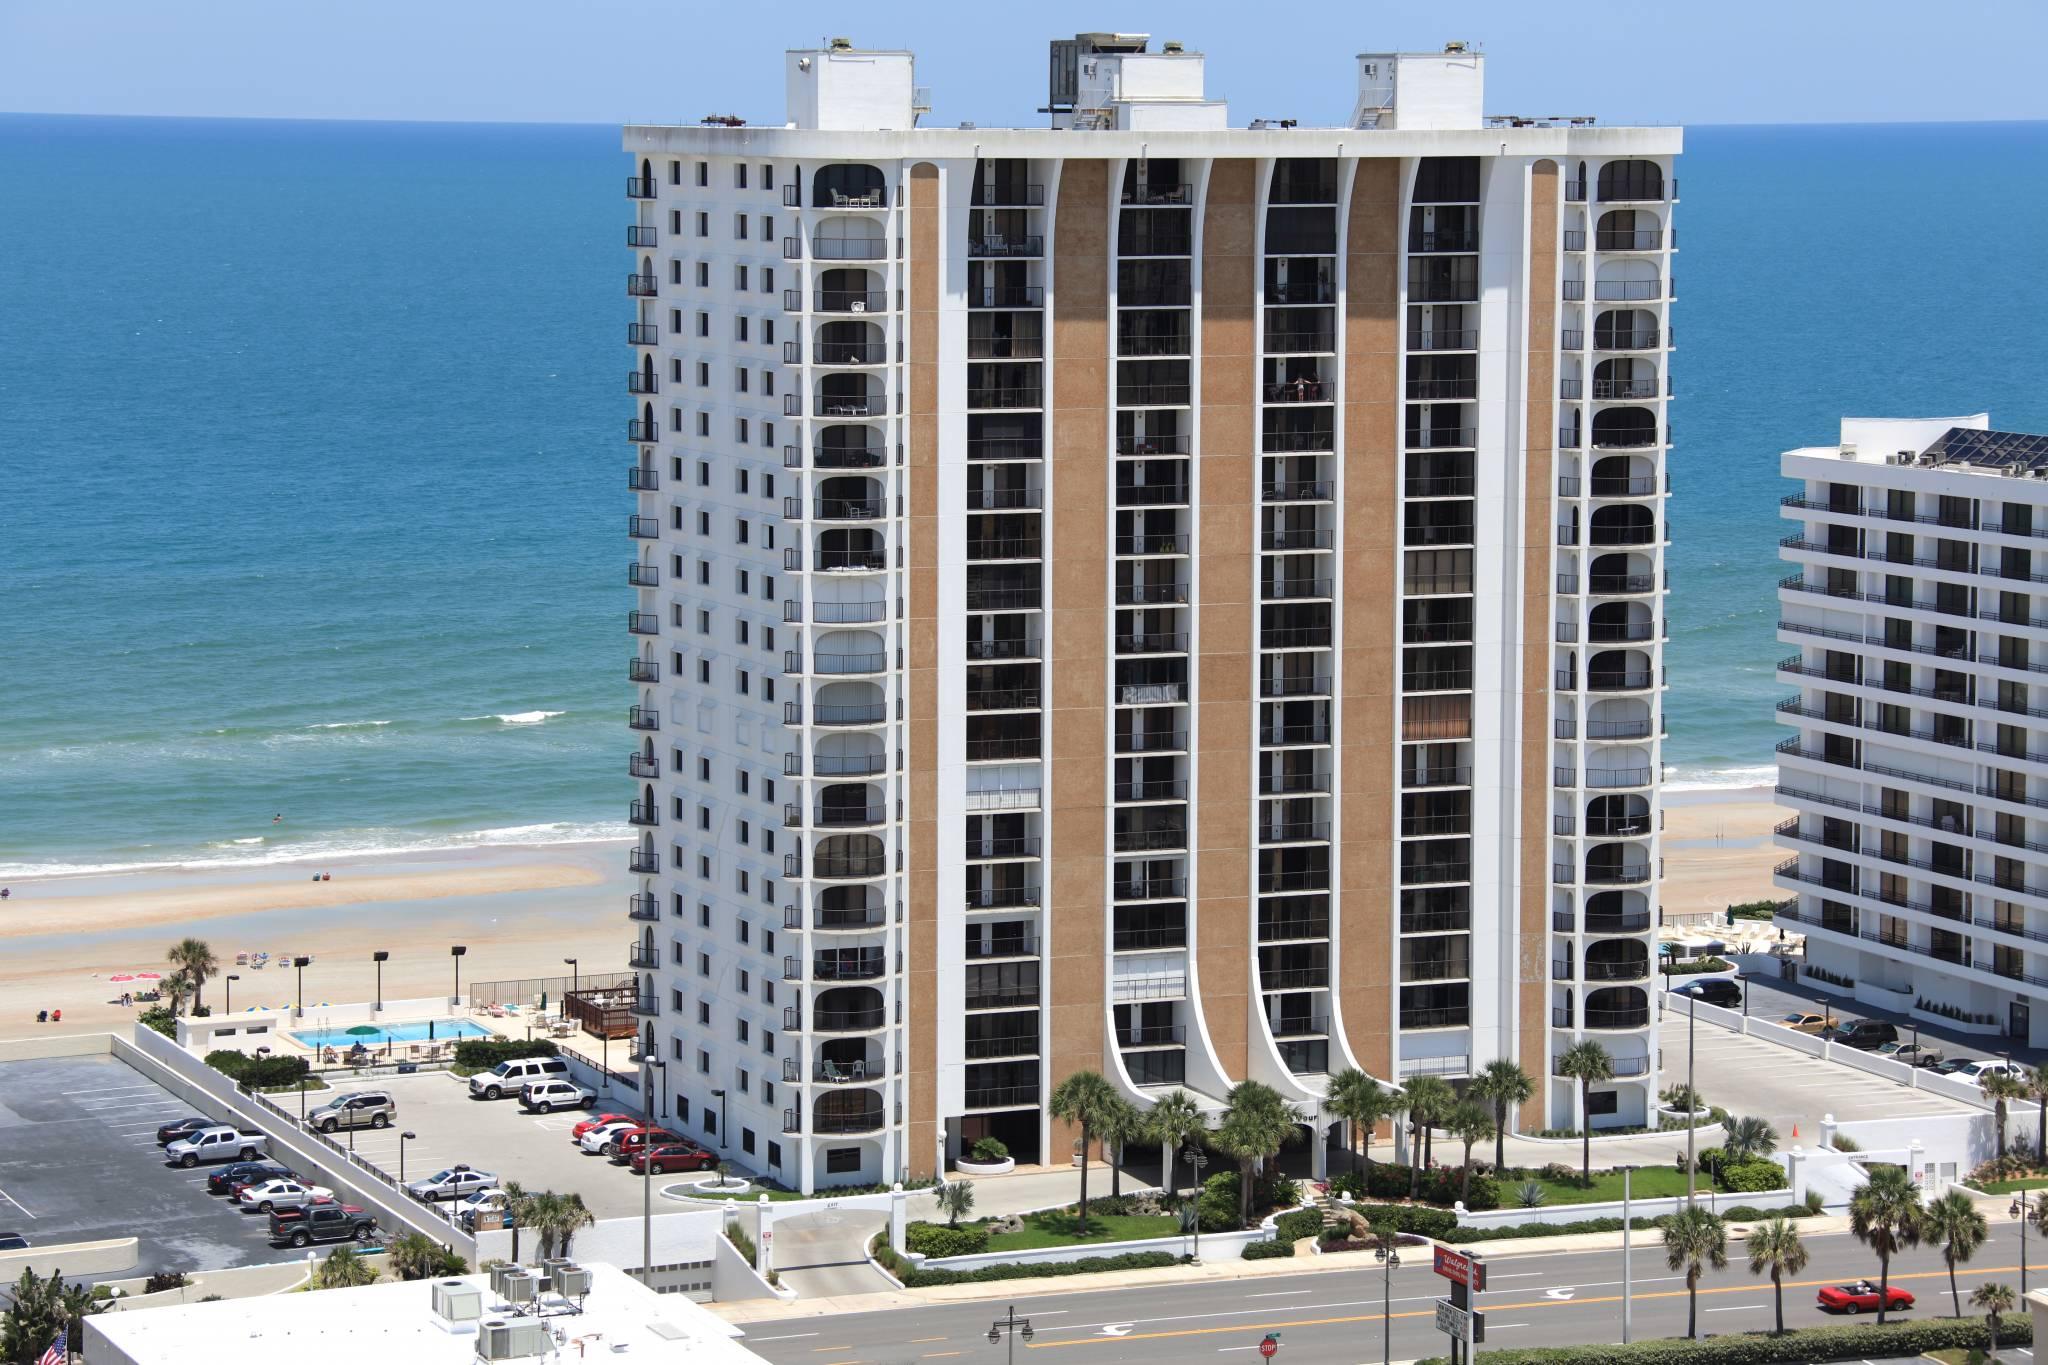 Daytona Beach Shores City Manager